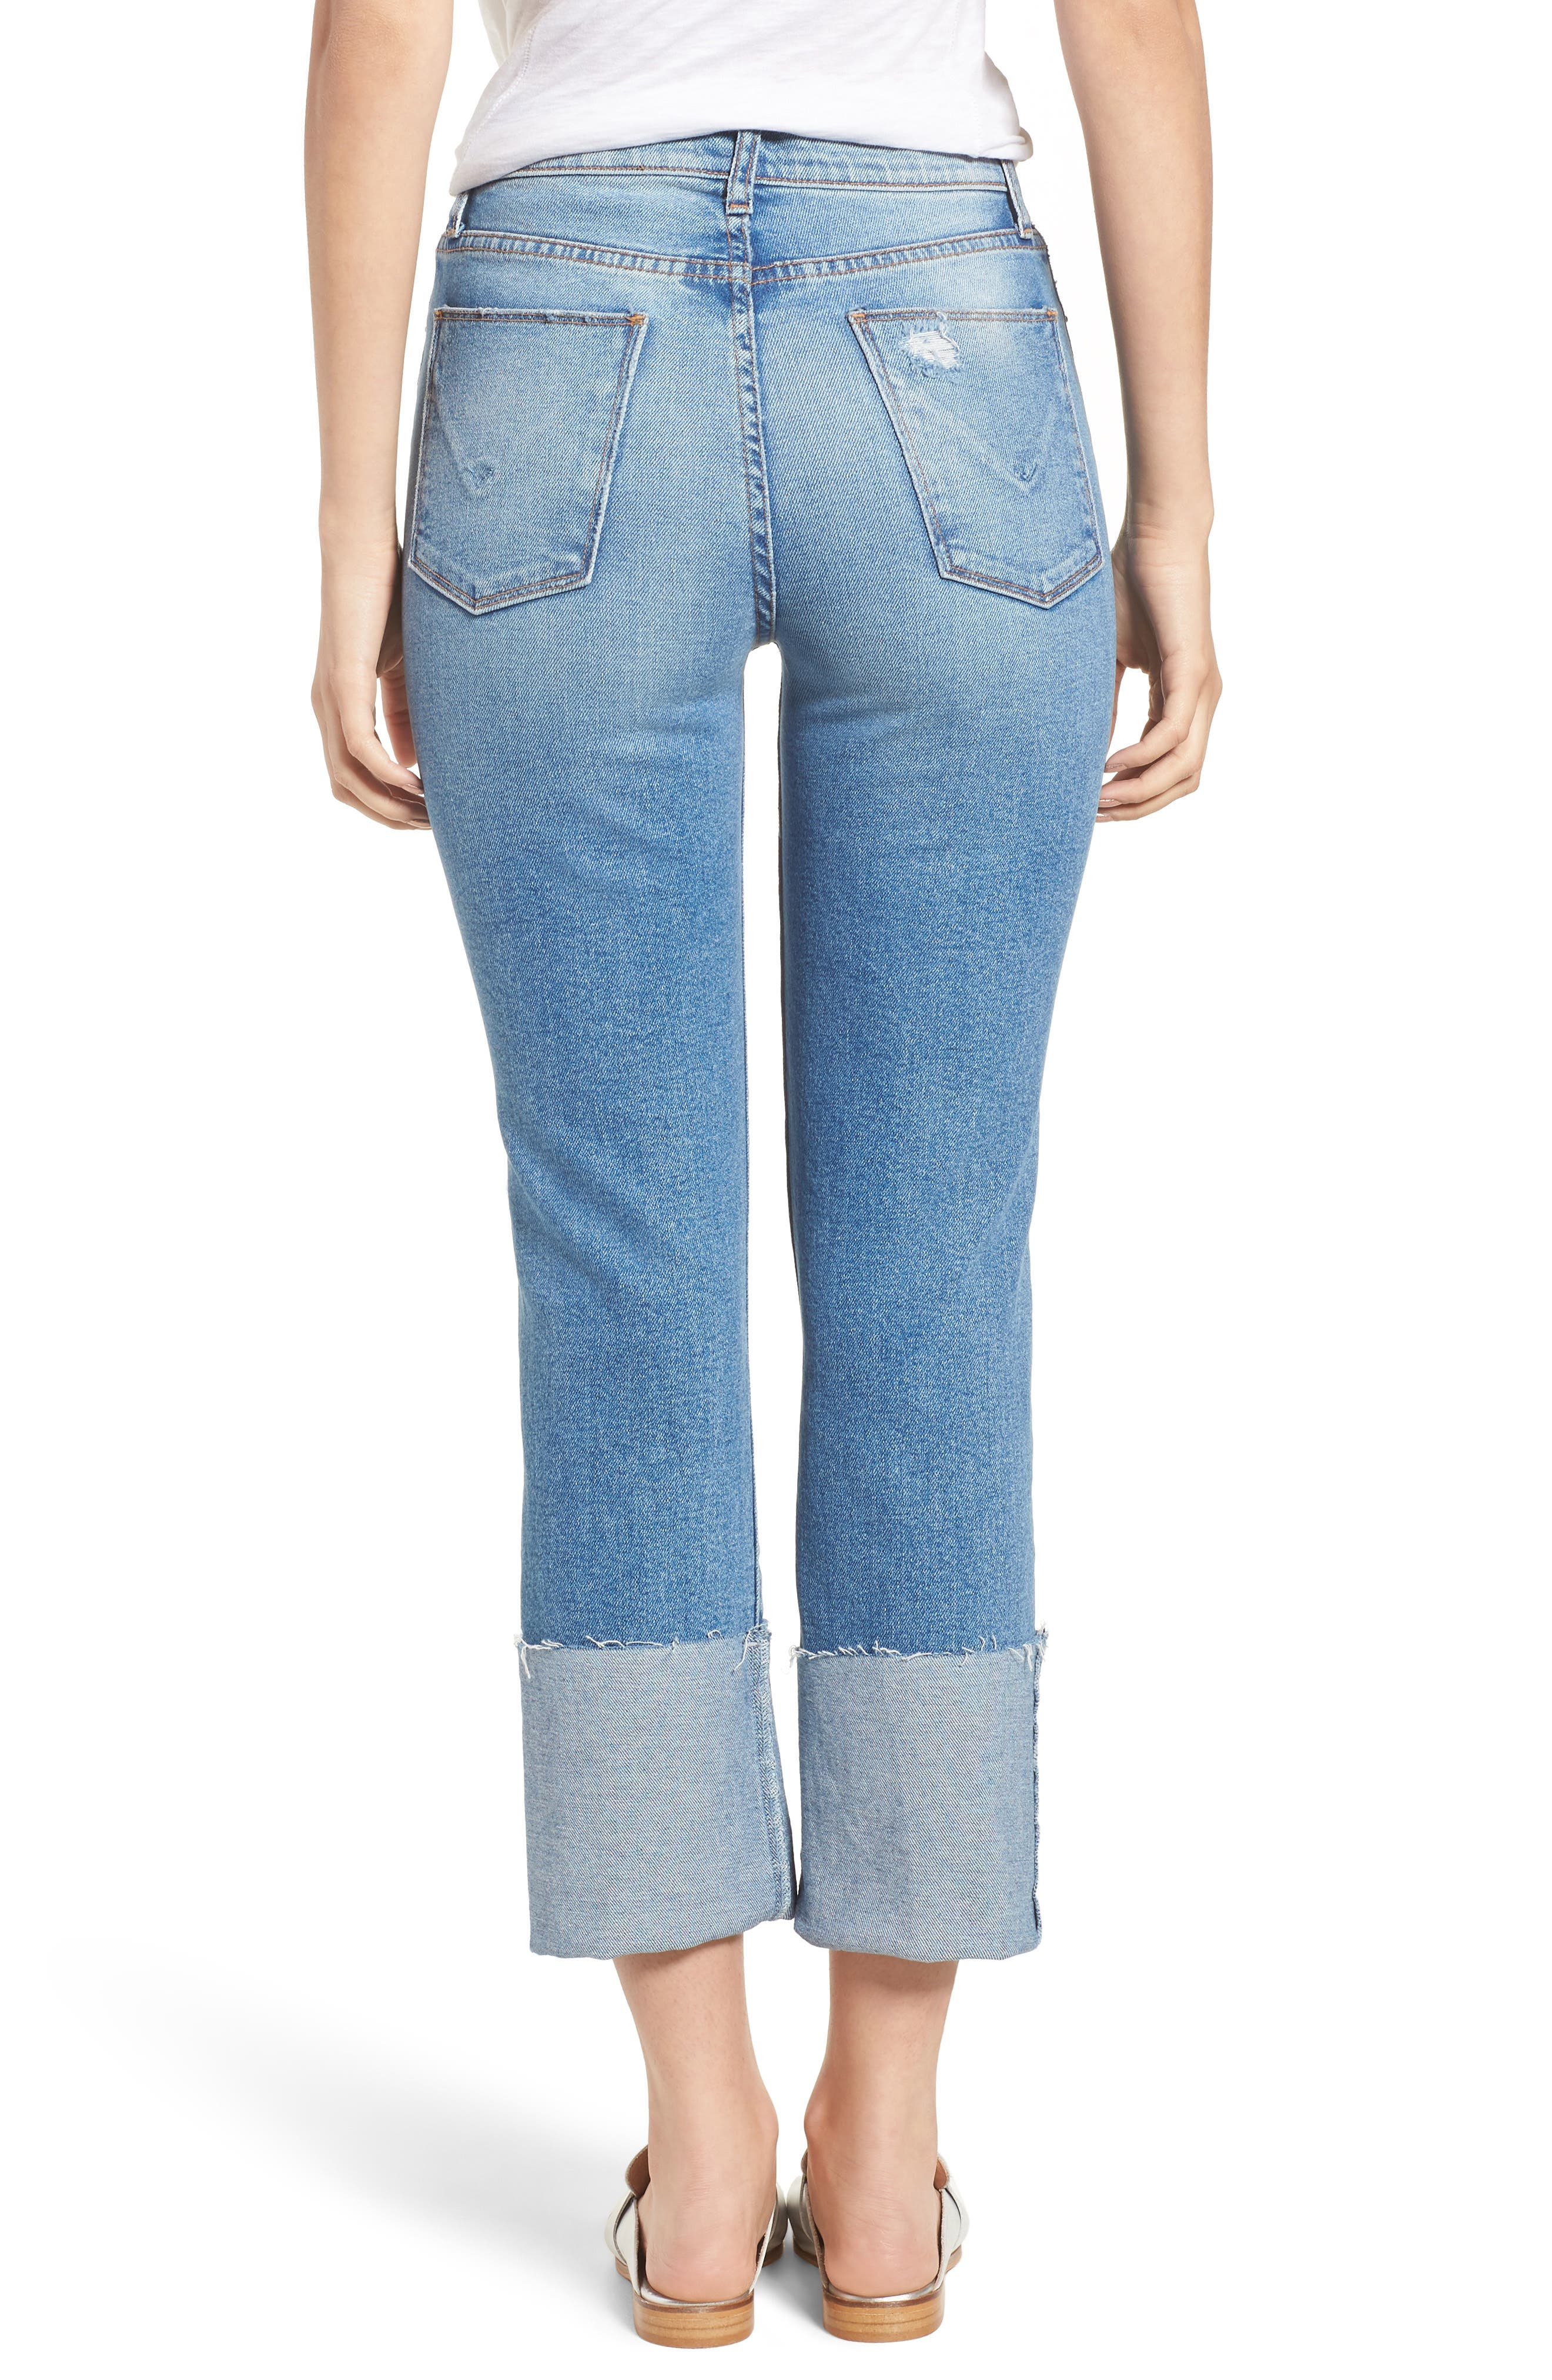 Zoeey High Waist Cuff Straight Leg Jeans,                             Alternate thumbnail 2, color,                             425